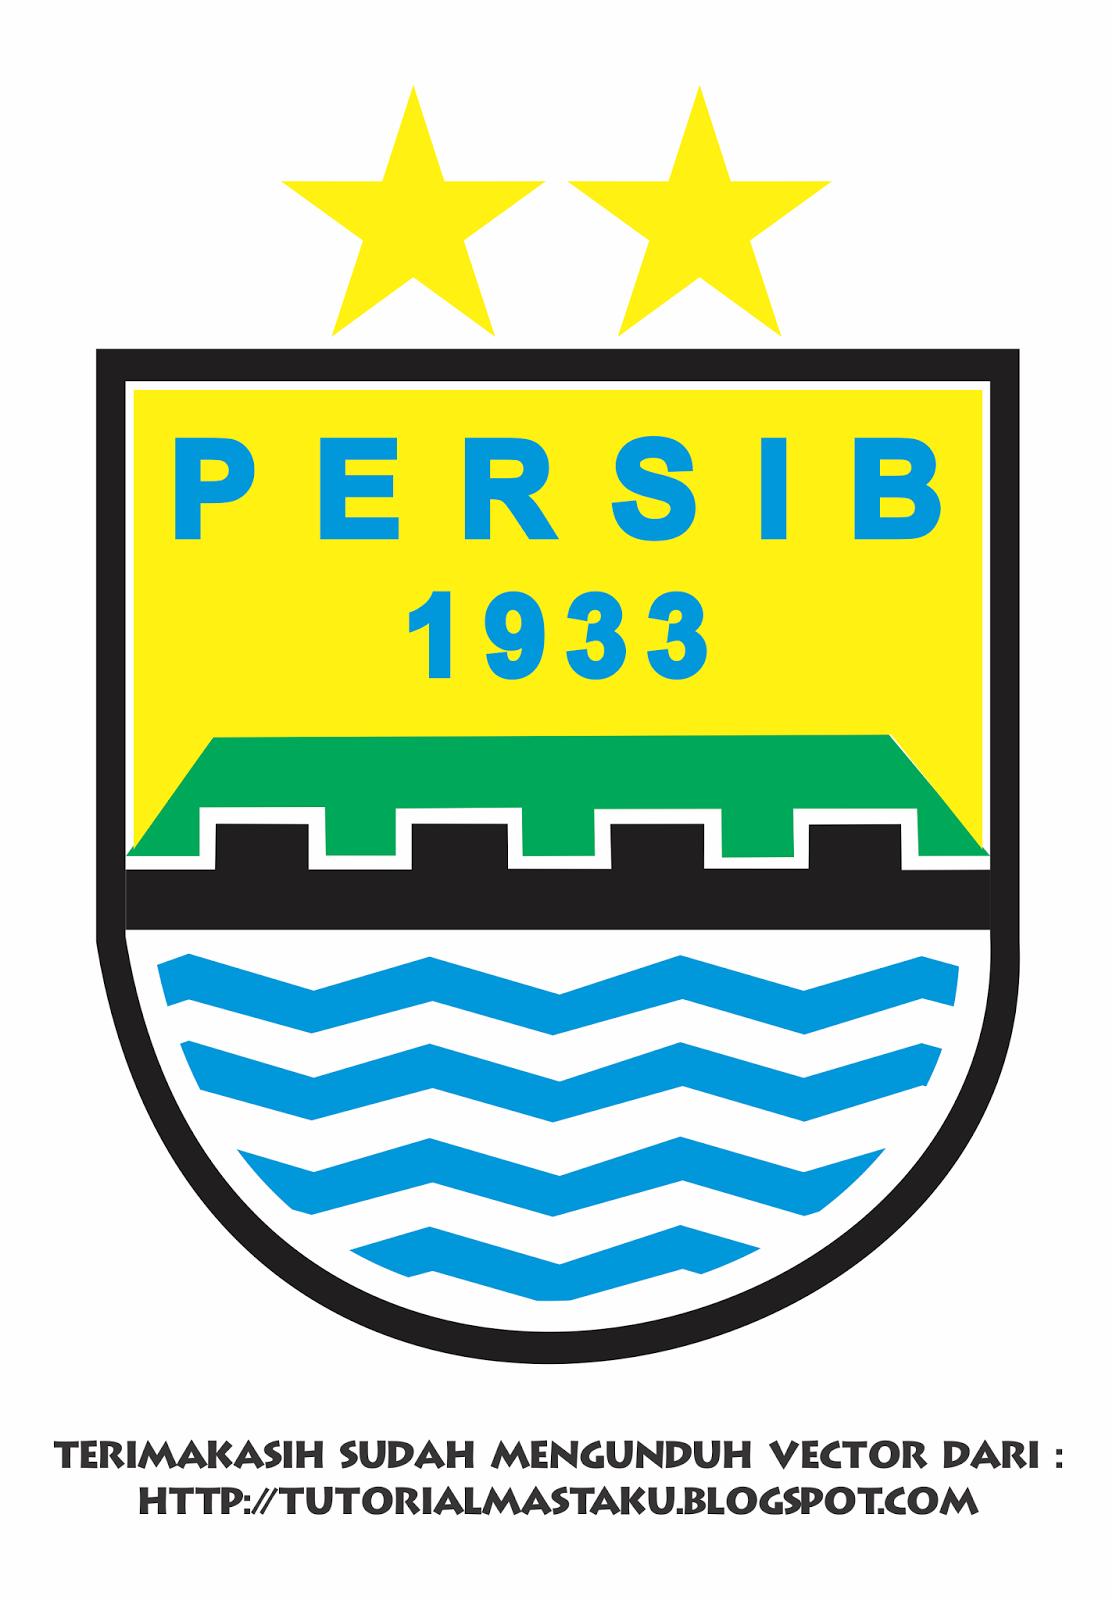 Download Vector Logo Persib Bandung Gratis! - Tutorial Masta